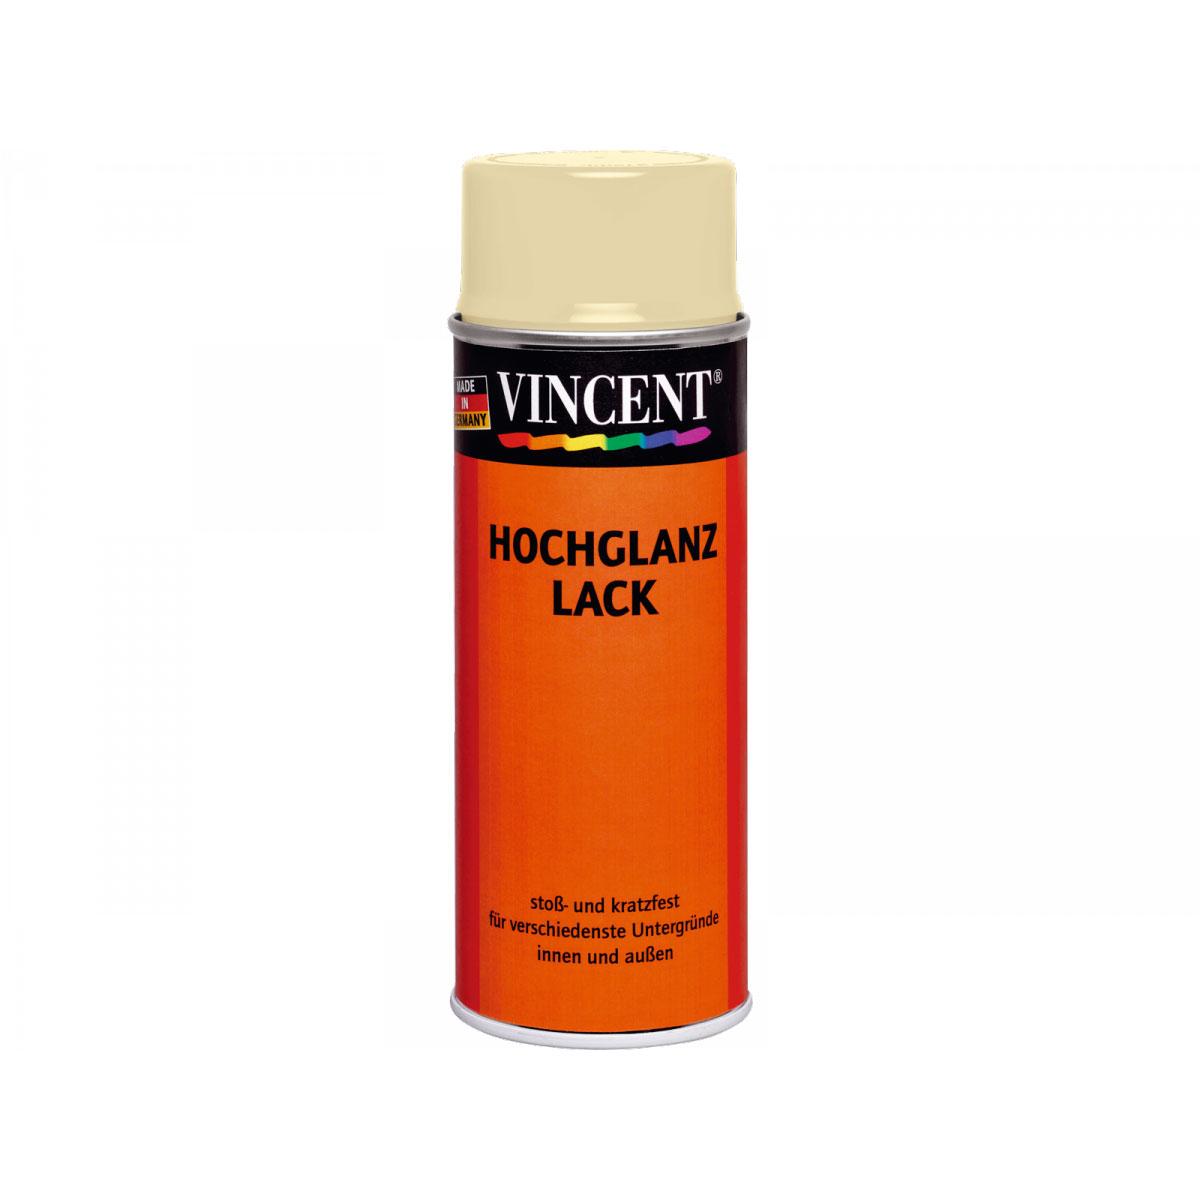 Vincent Hochglanzlack hellelfenb 400 ml